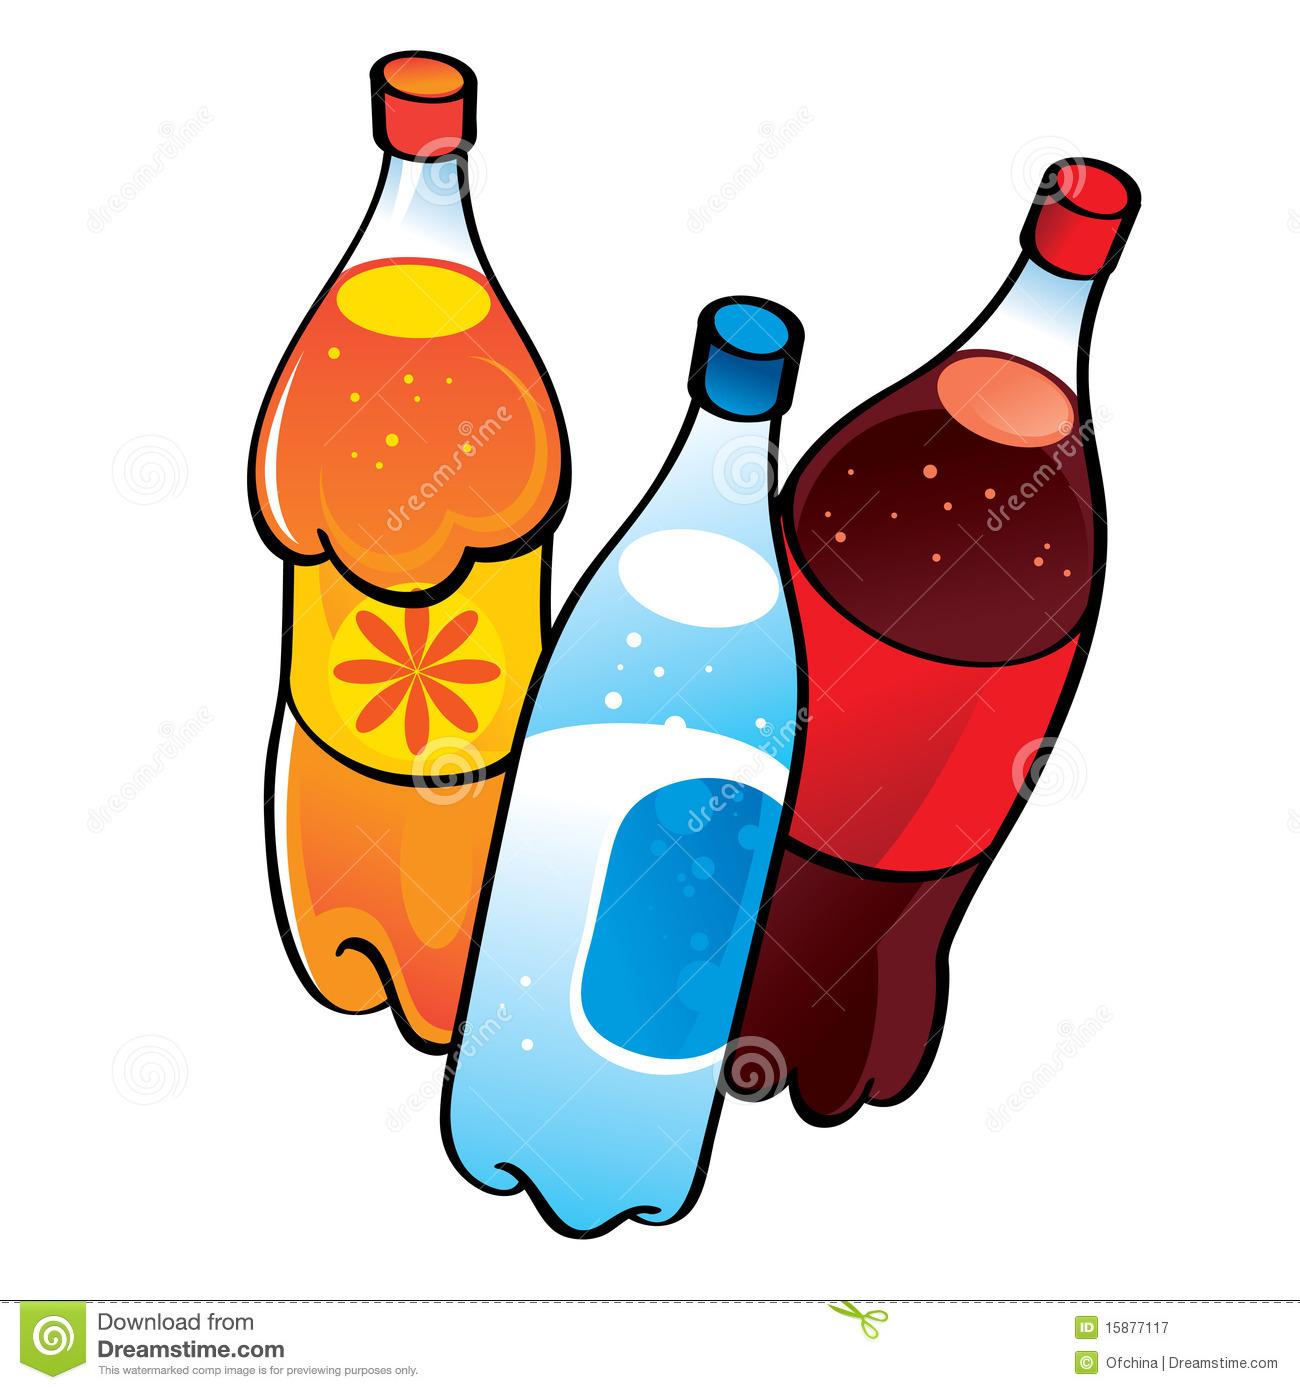 Soft Drinks Clip Art Drinks Clipart-Soft Drinks Clip Art Drinks Clipart-11